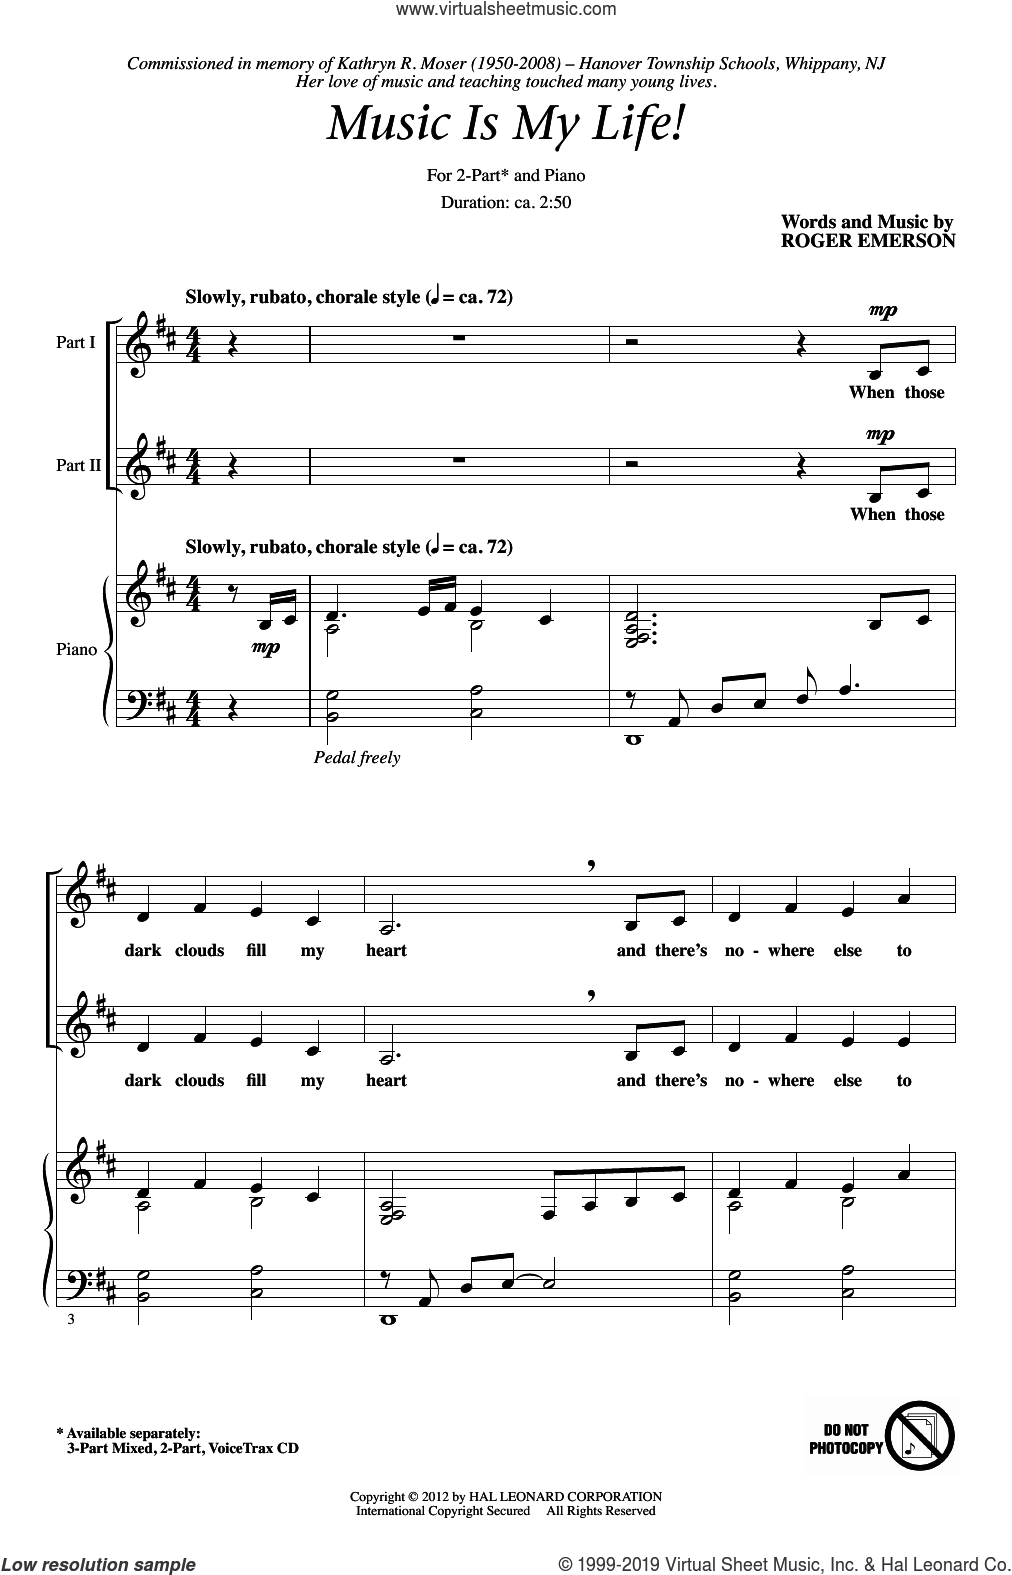 Music Is My Life! sheet music for choir (2-Part) by Roger Emerson, intermediate duet